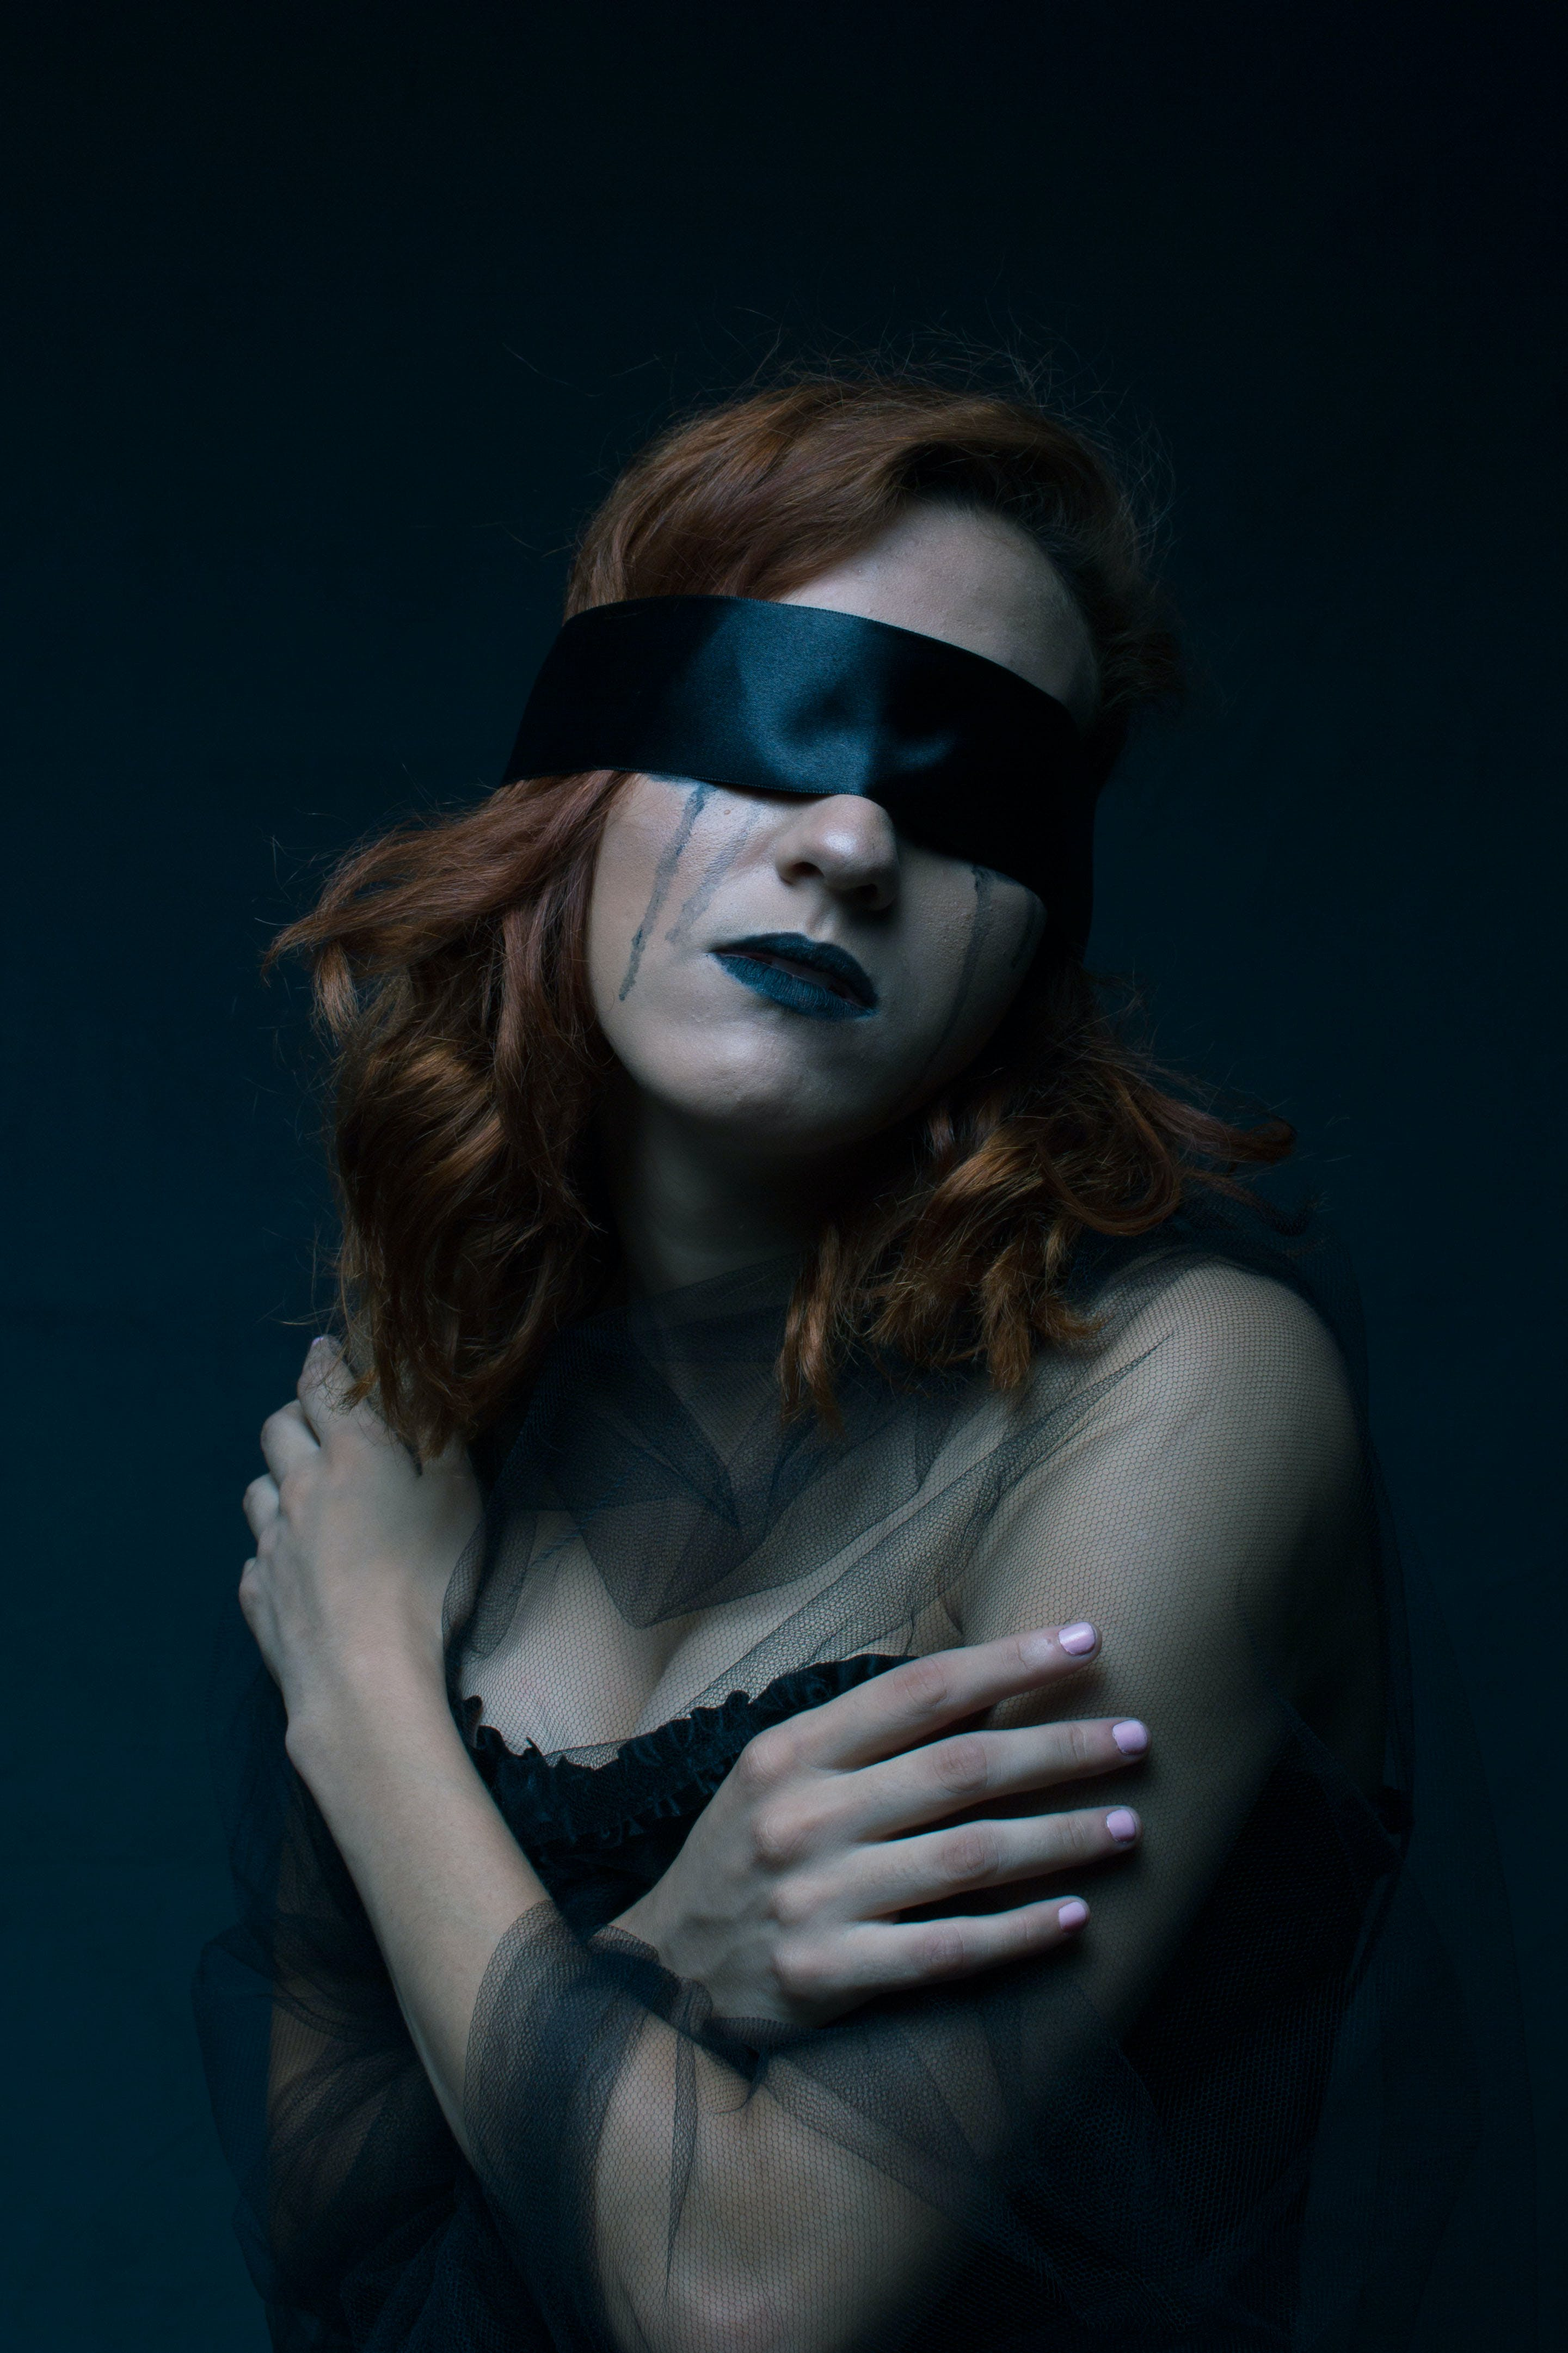 Woman Wearing Black Sweetheart Neckline Dress With Black Blindfold